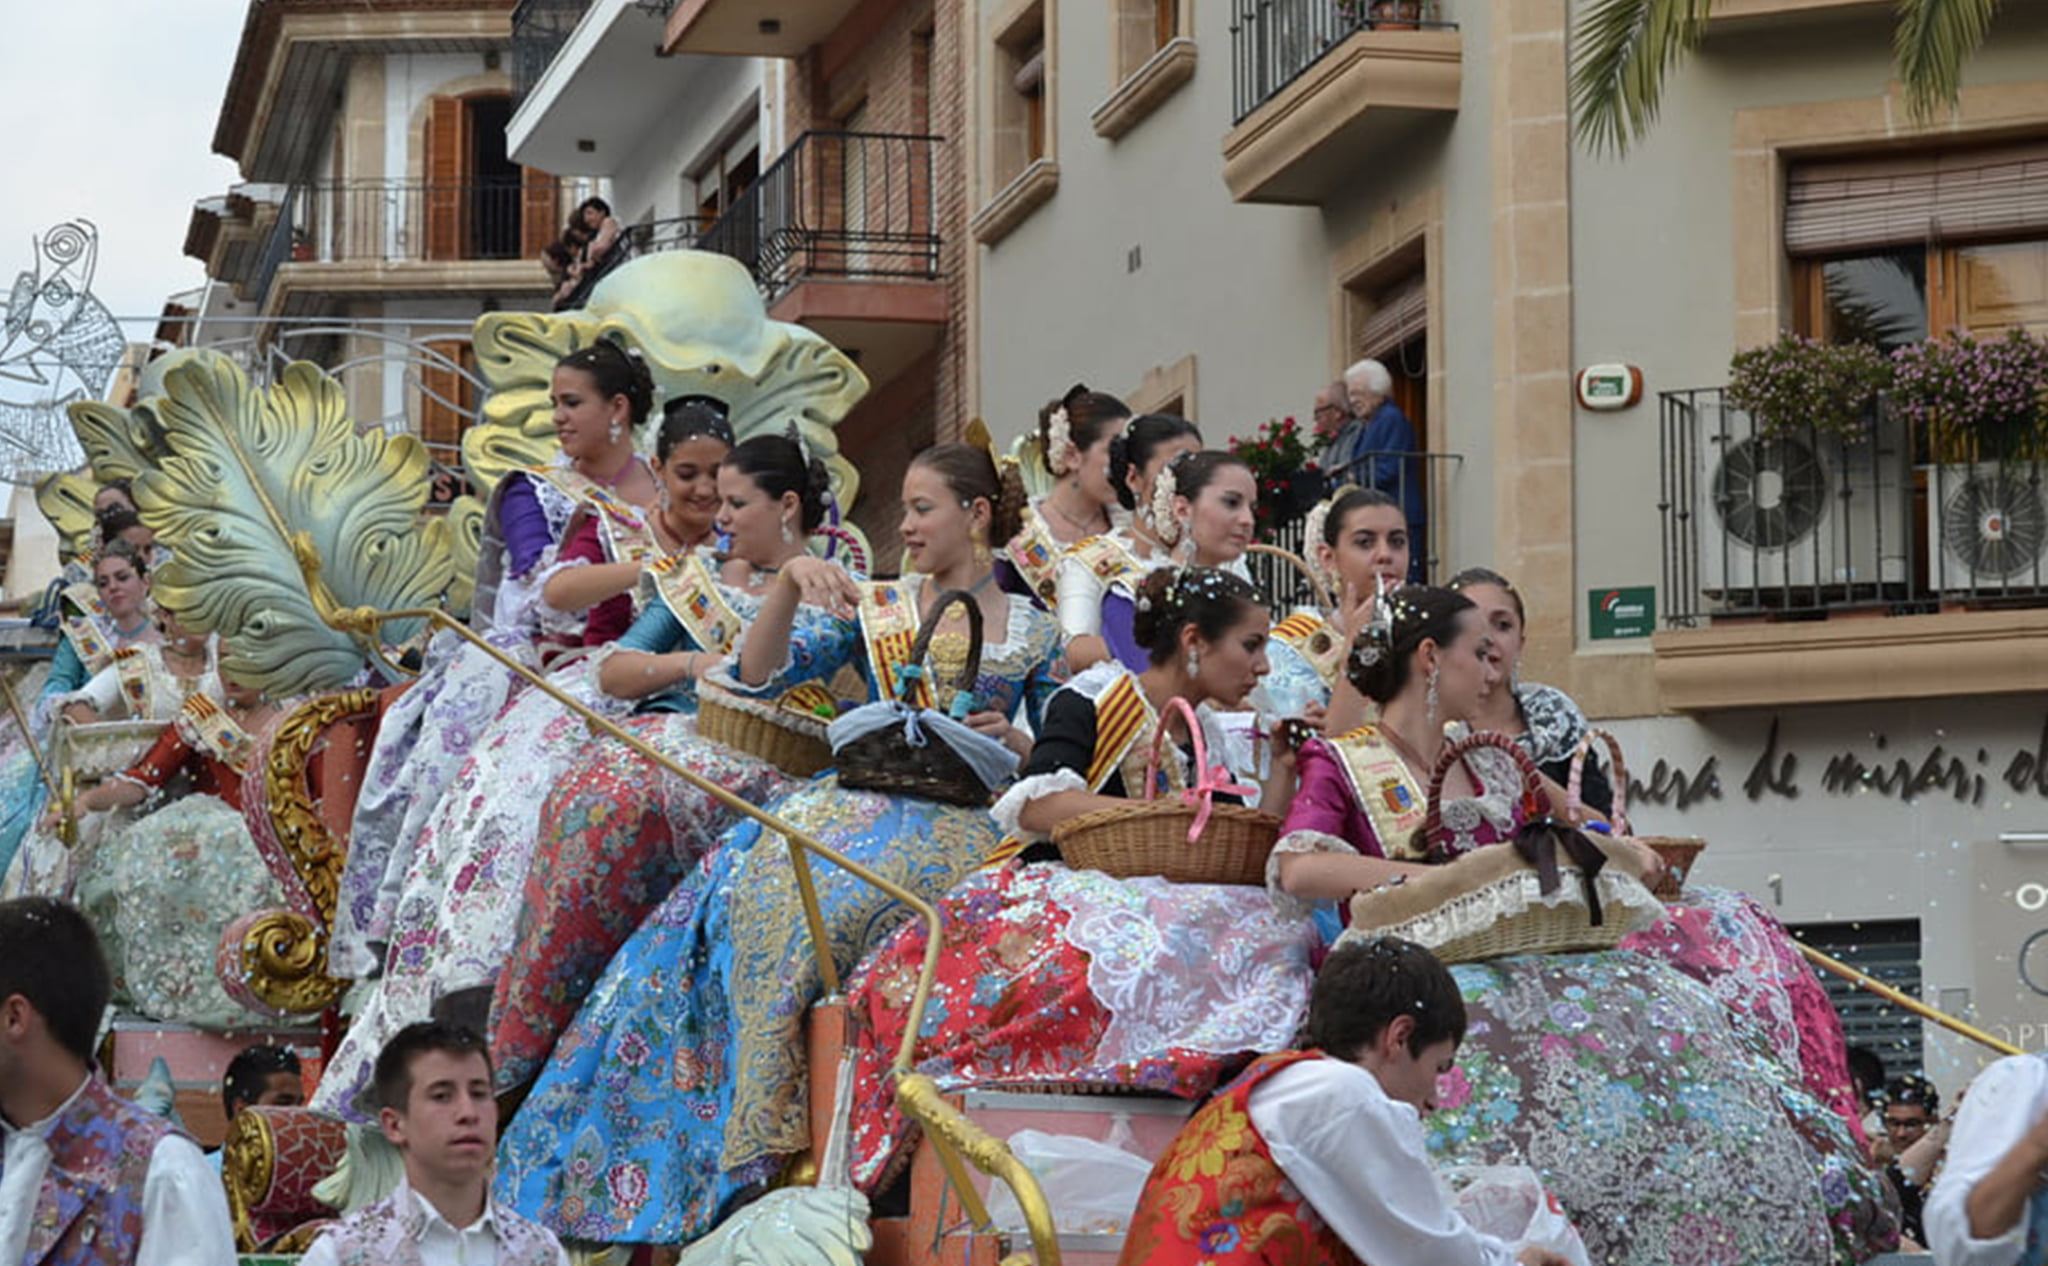 Cabalgata de carrozas en las fiestas de San Juan de Xàbia